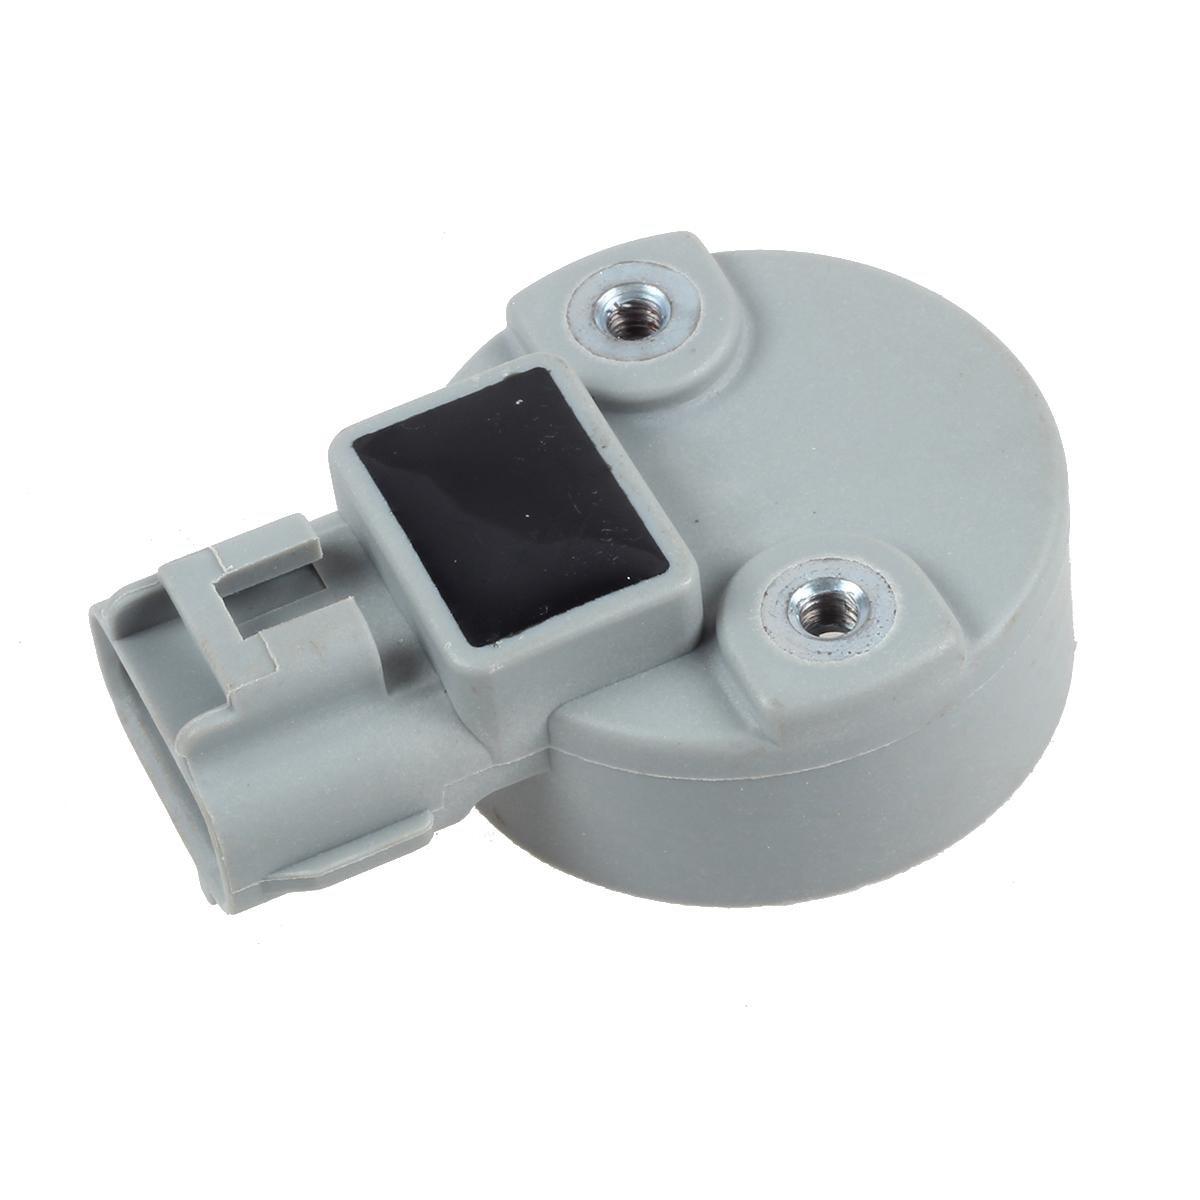 AUTEX Camshaft Position Sensor 4897023AA compatible w/ 1999 2000 2001 2002 2003 2004 JEEP Grand Cherokee 2000 2001 Jeep Cherokee 2001 2002 2003 2004 Jeep TJ 2000 2001 2002 2003 2004 Jeep Wrangler